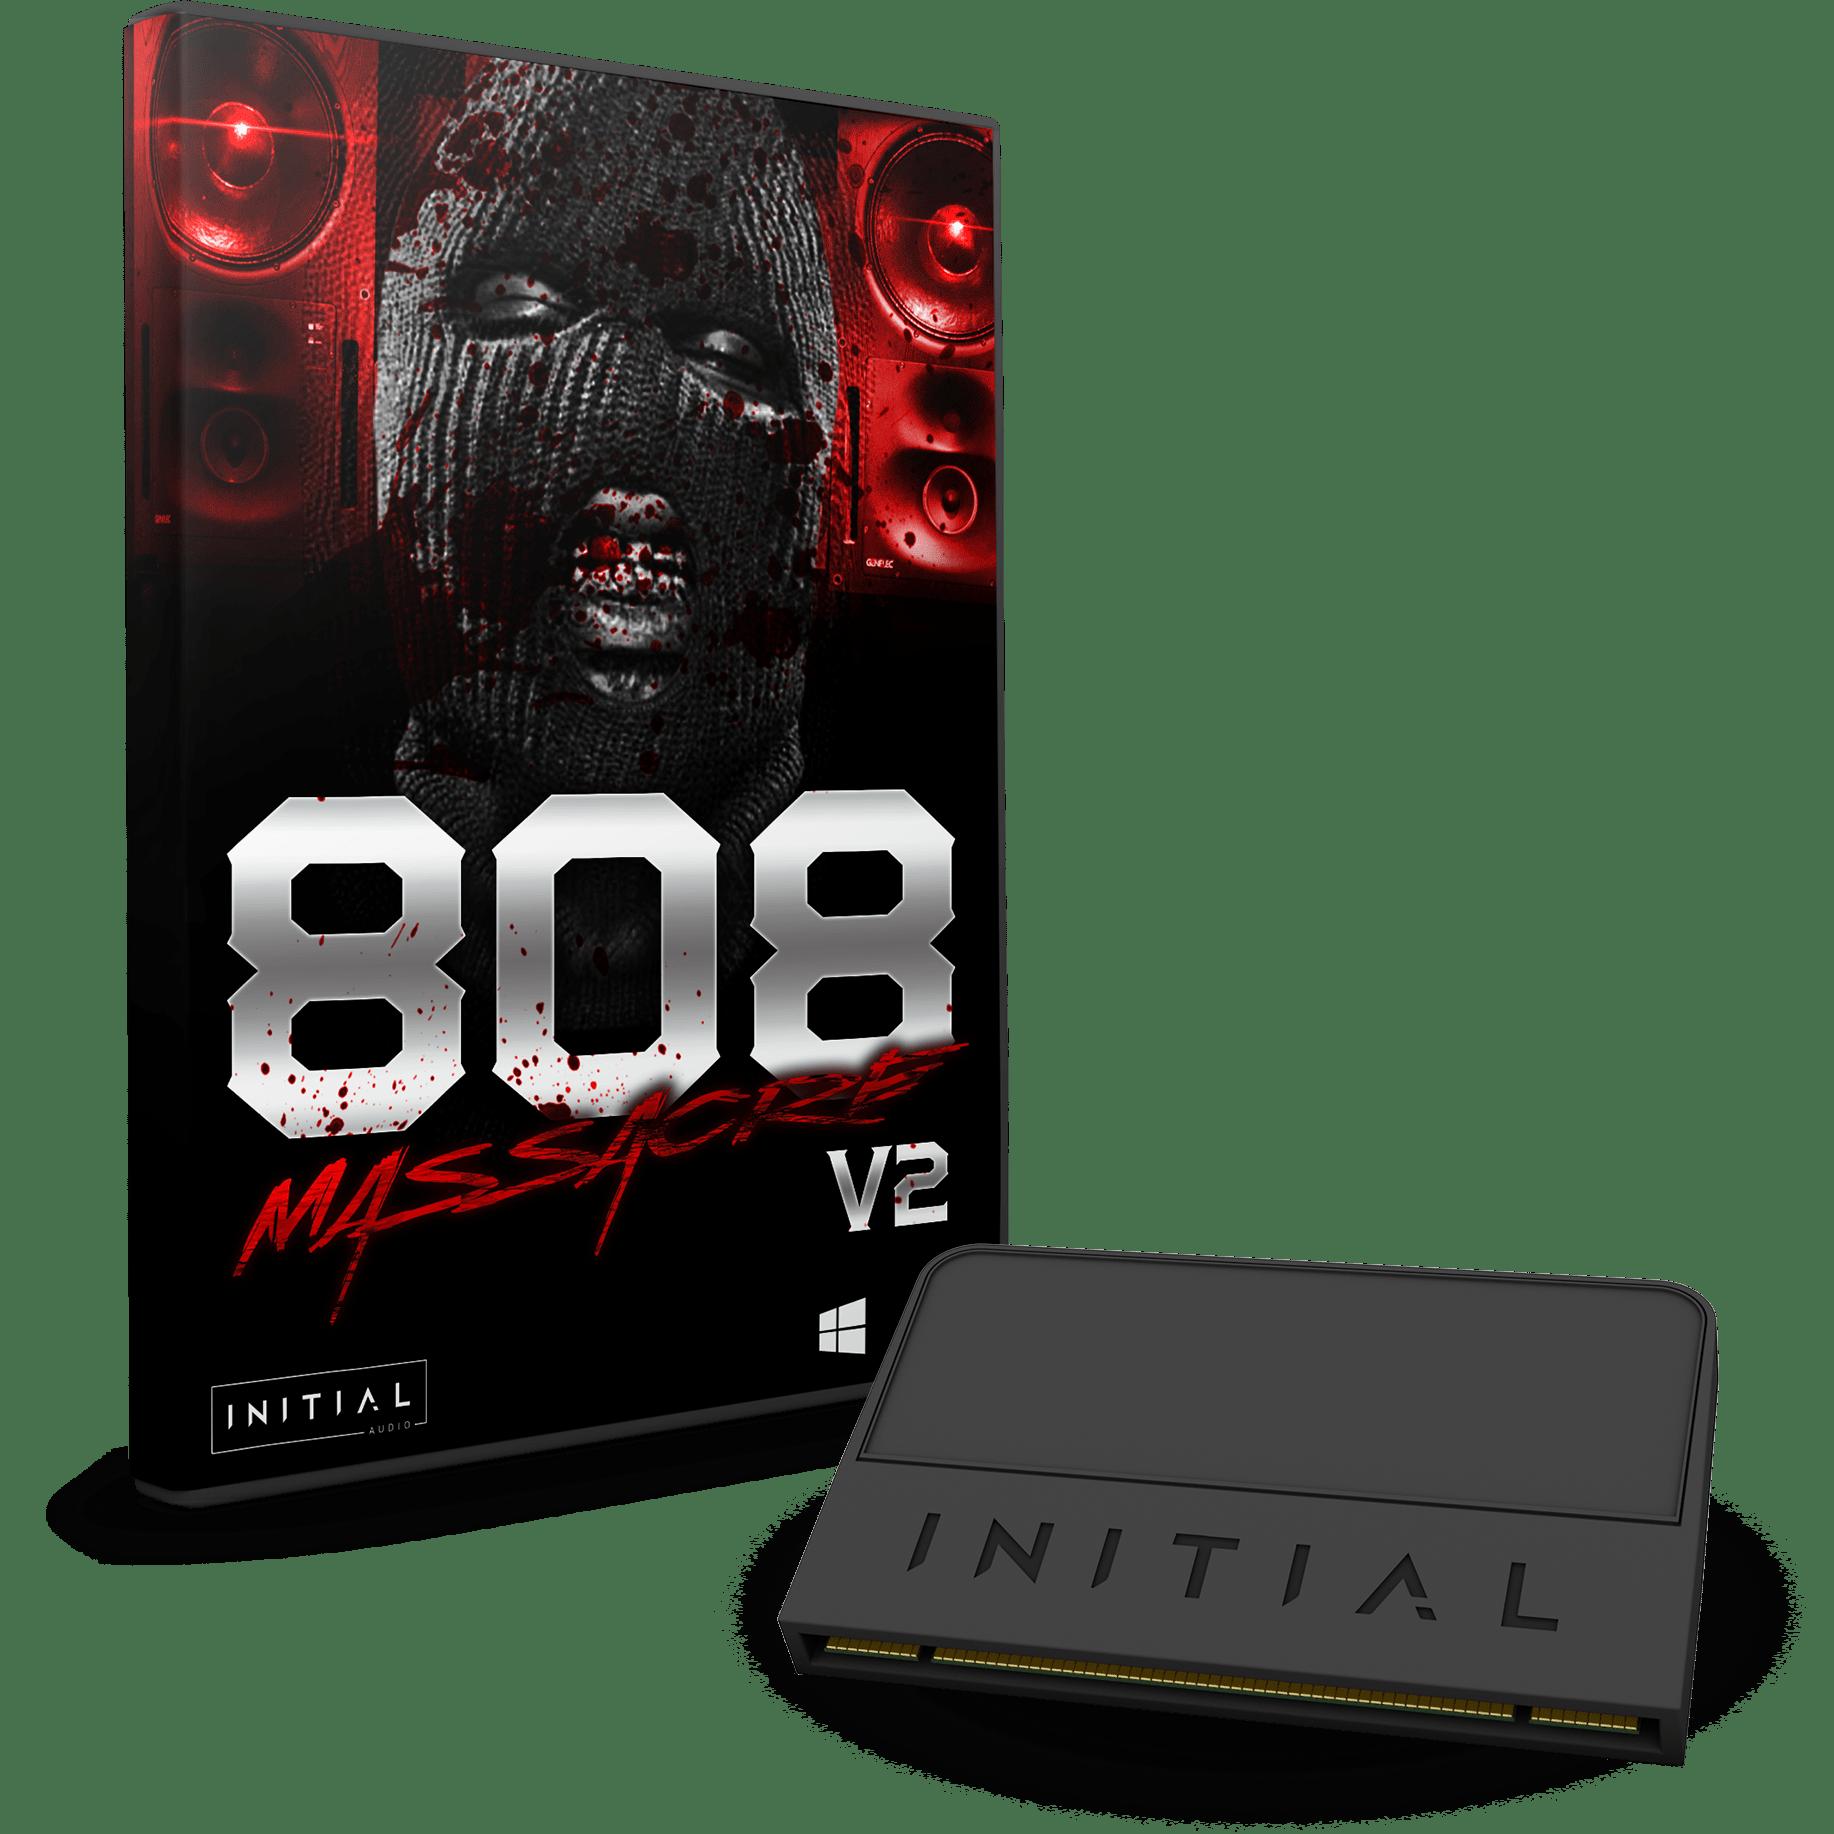 808 MASSACRE V2 - HEATUP3 XP